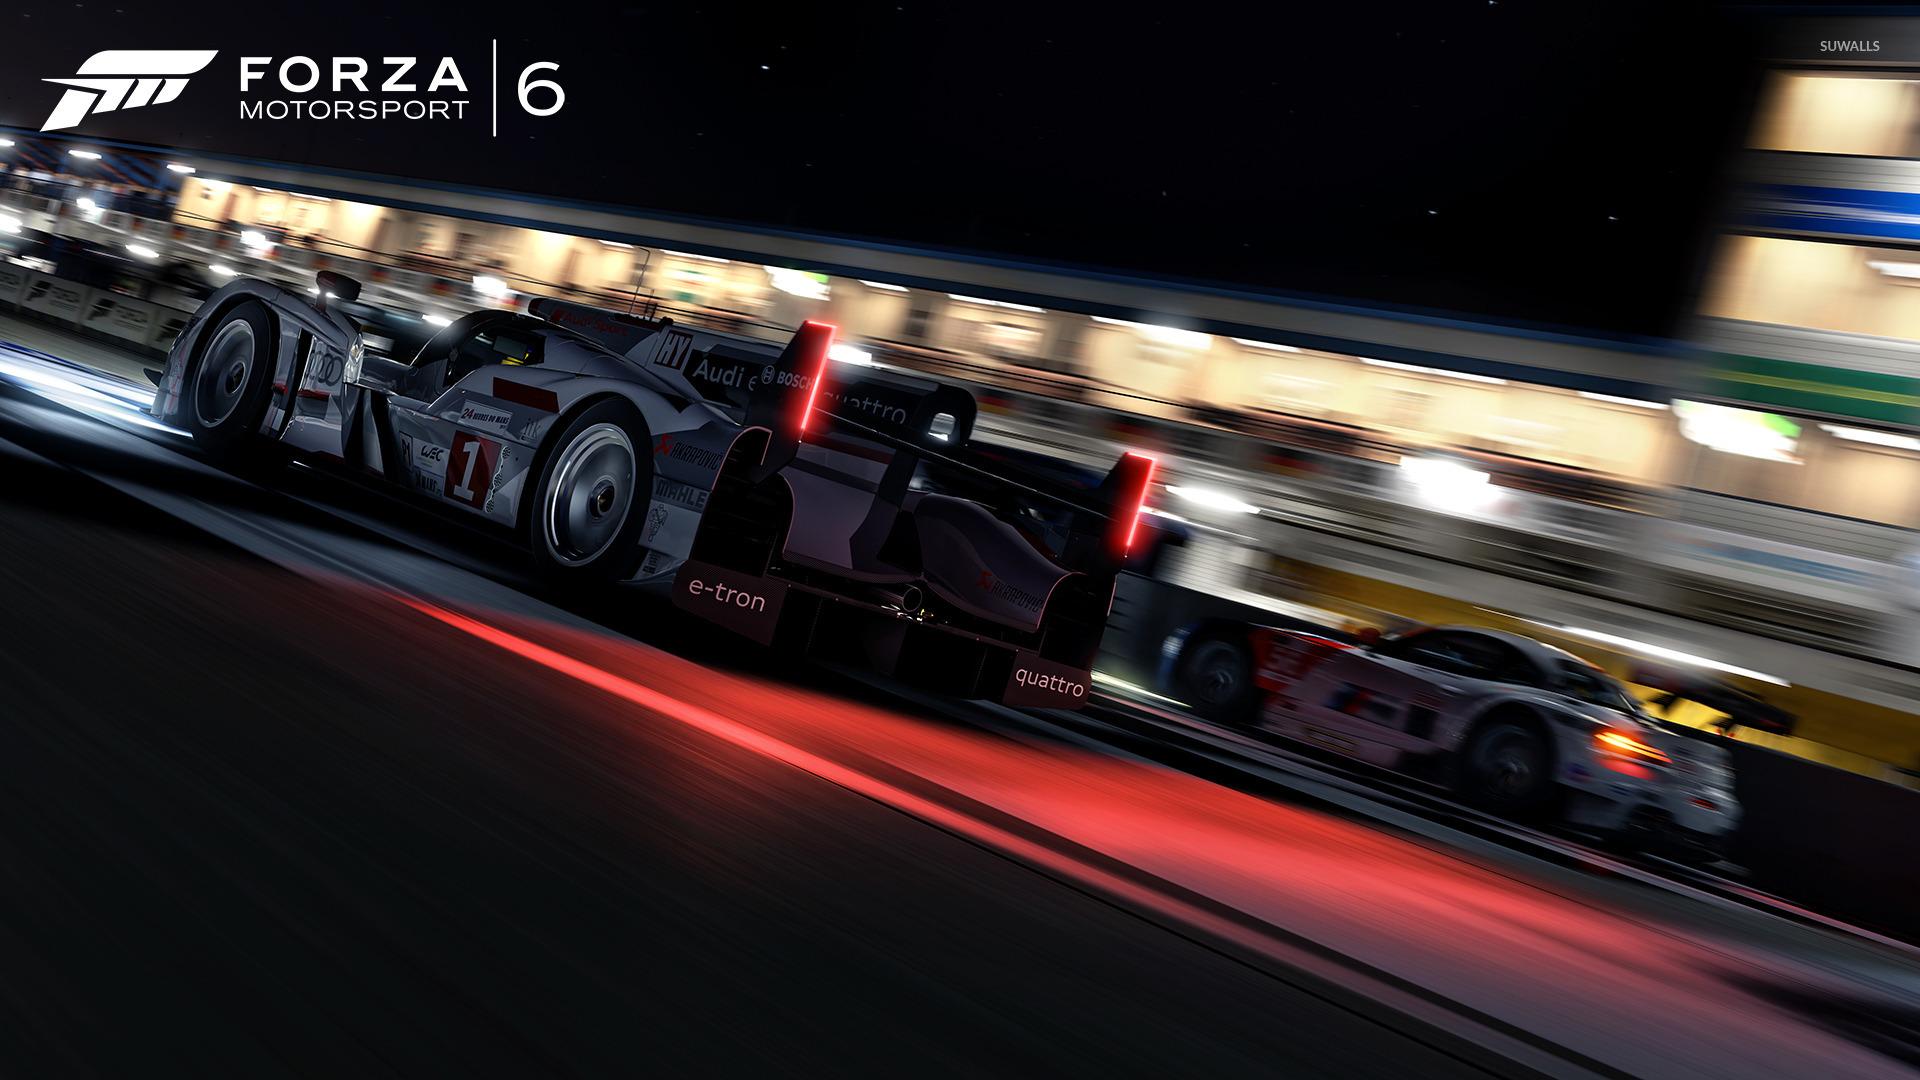 tron quattro   Forza Motorsport 6 wallpaper   Game wallpapers   44845 1366x768